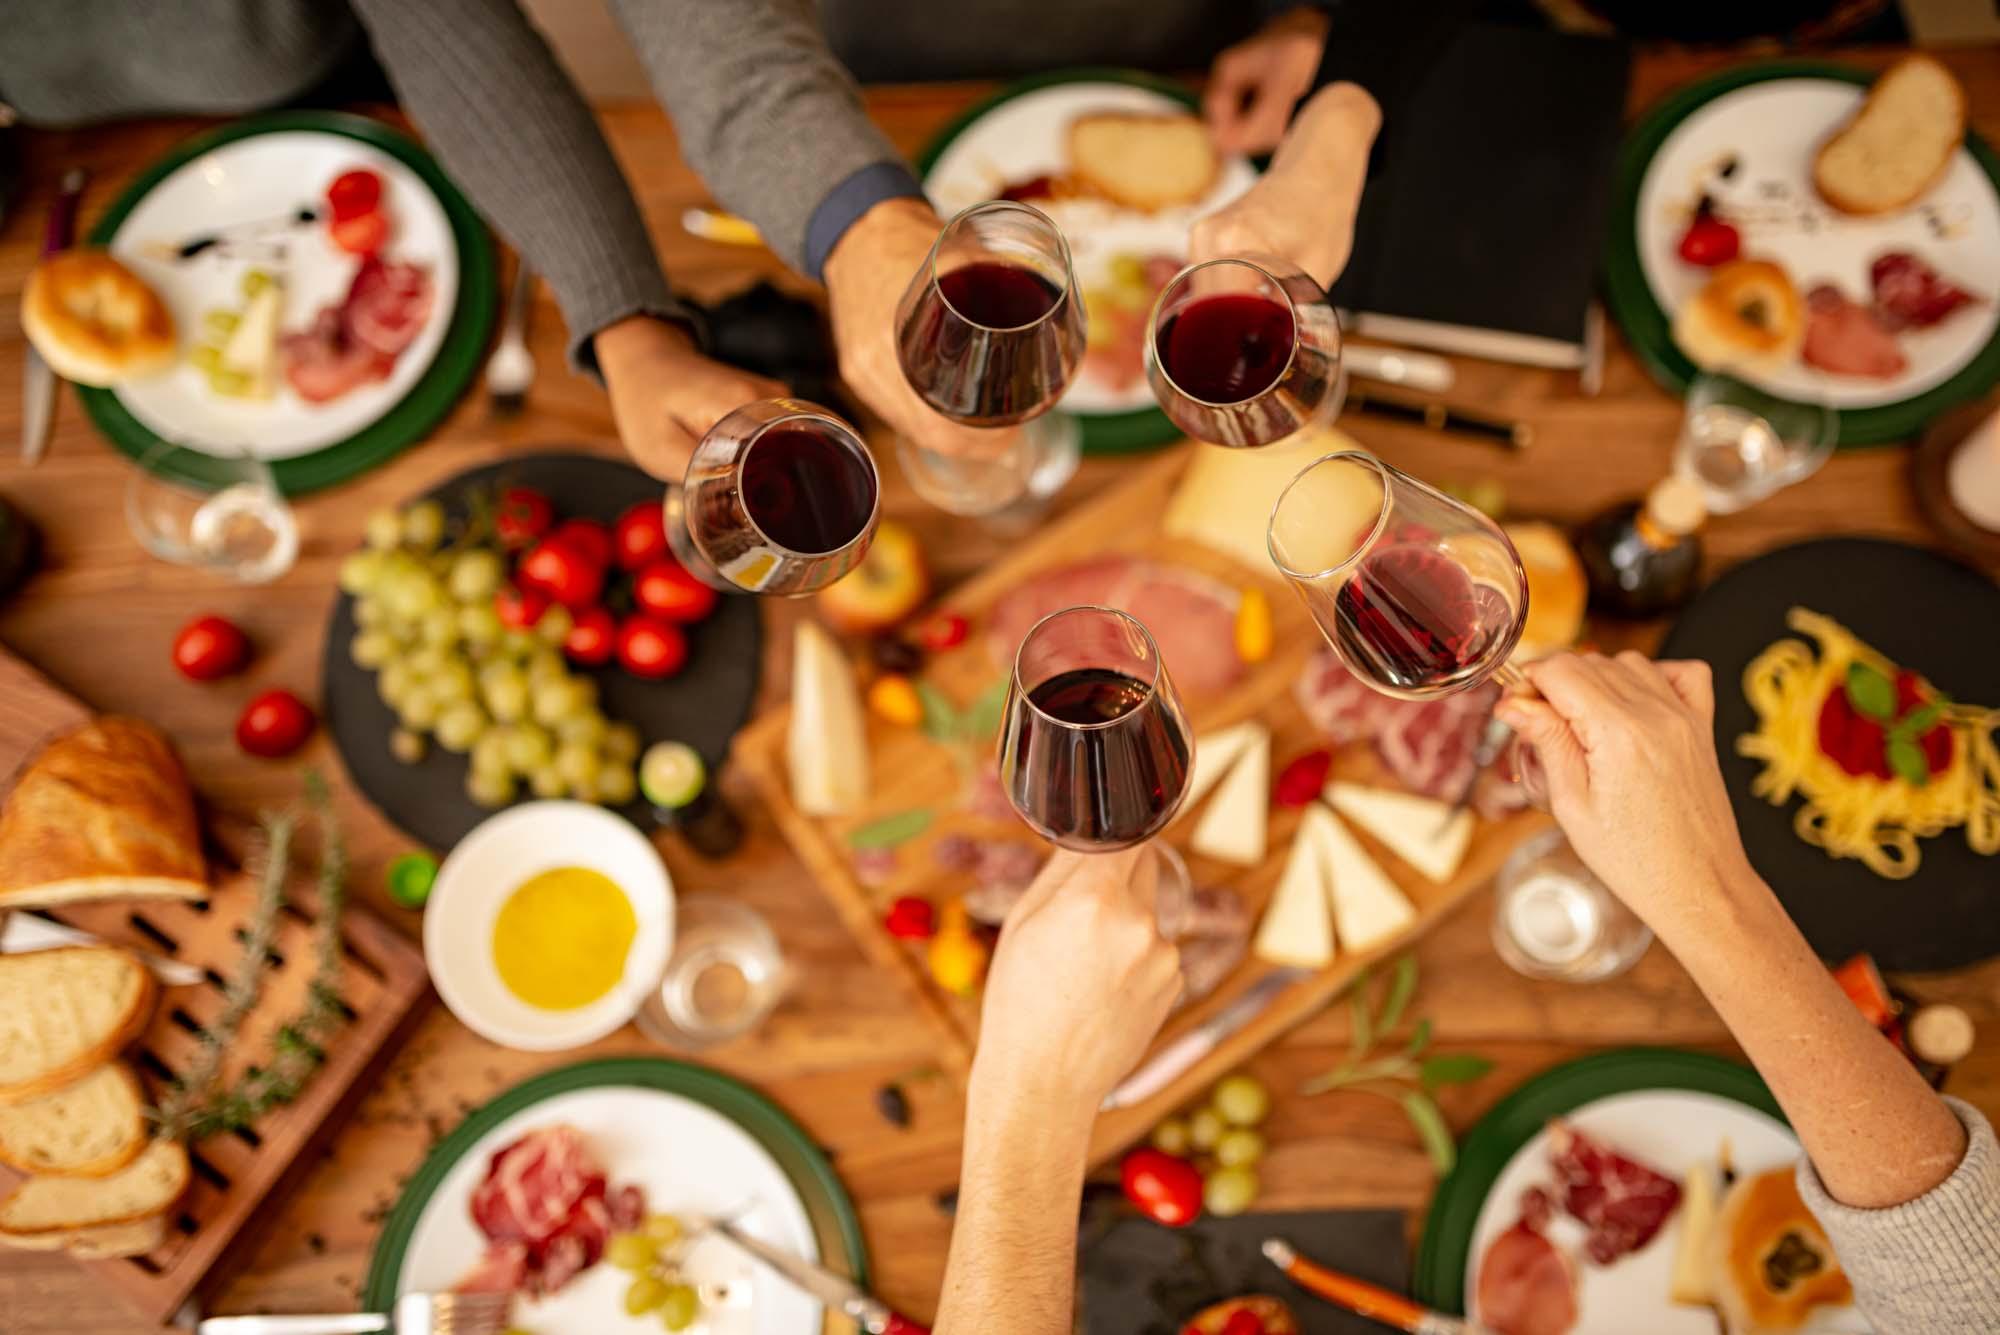 Corsi Di Cucina Formazione Manageriale a Lucca